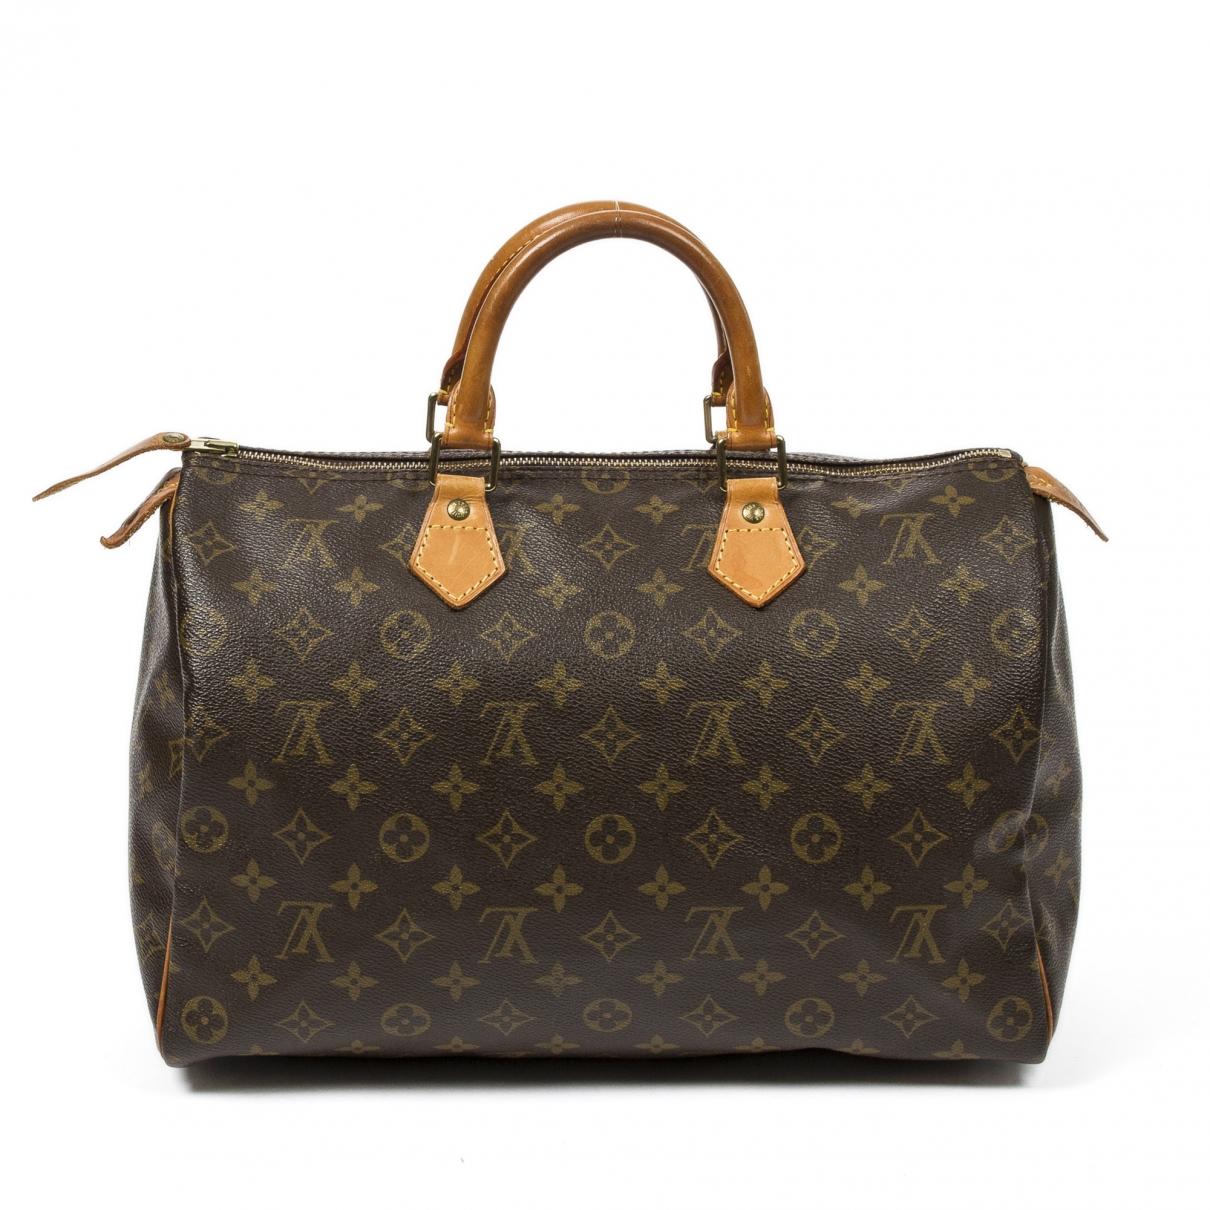 Louis Vuitton Speedy Brown Leather handbag for Women \N